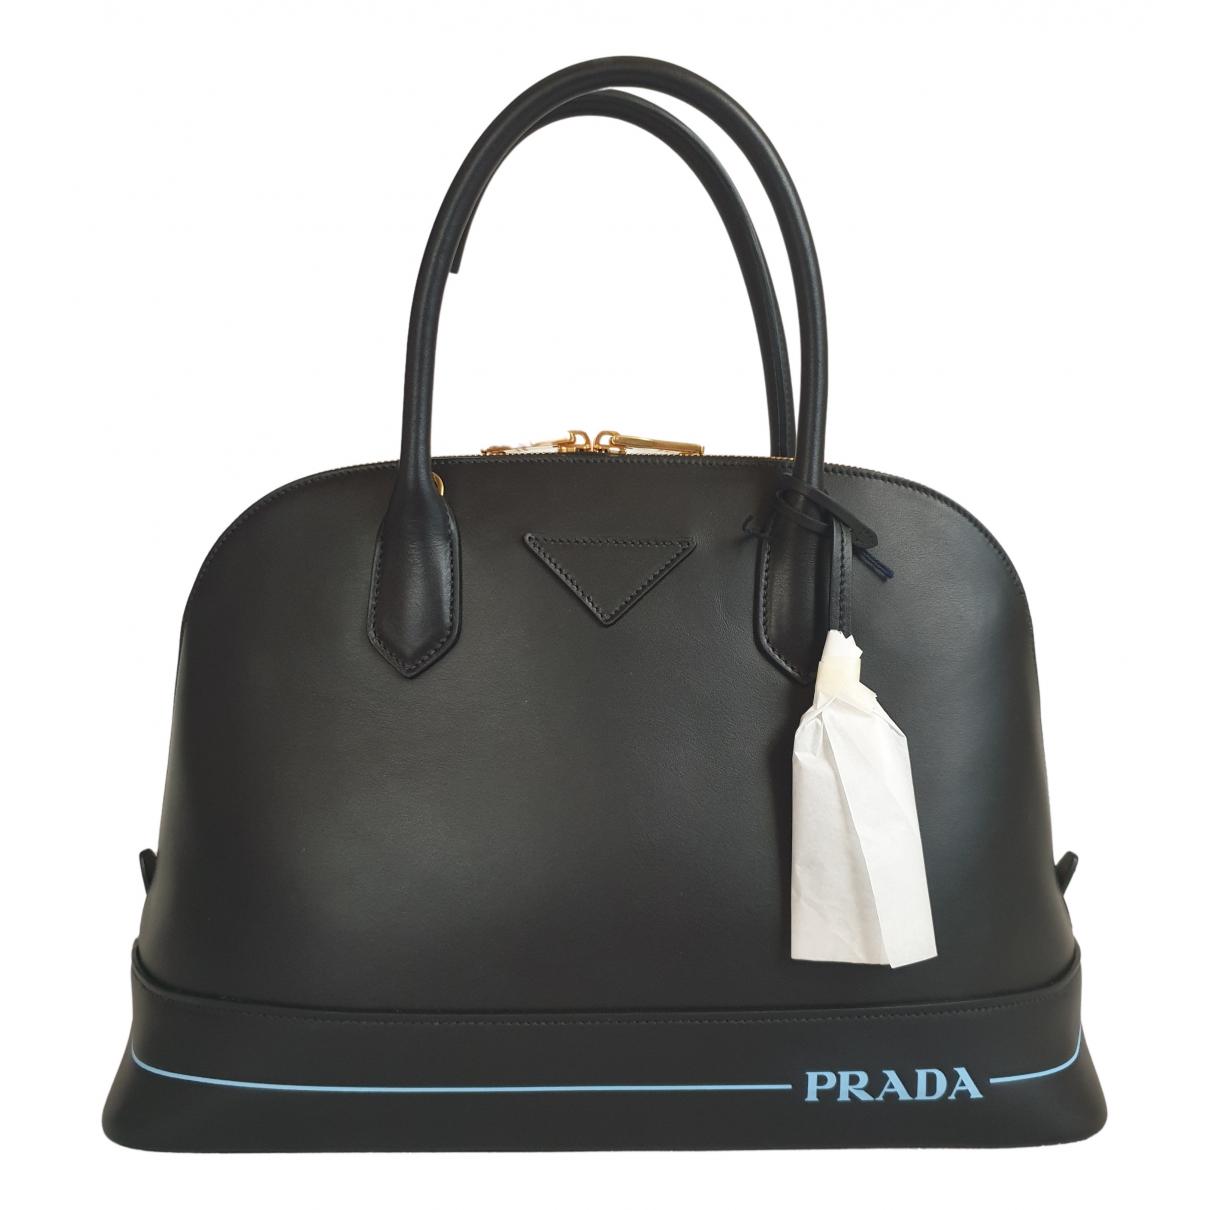 Prada Mirage Black Pony-style calfskin handbag for Women N